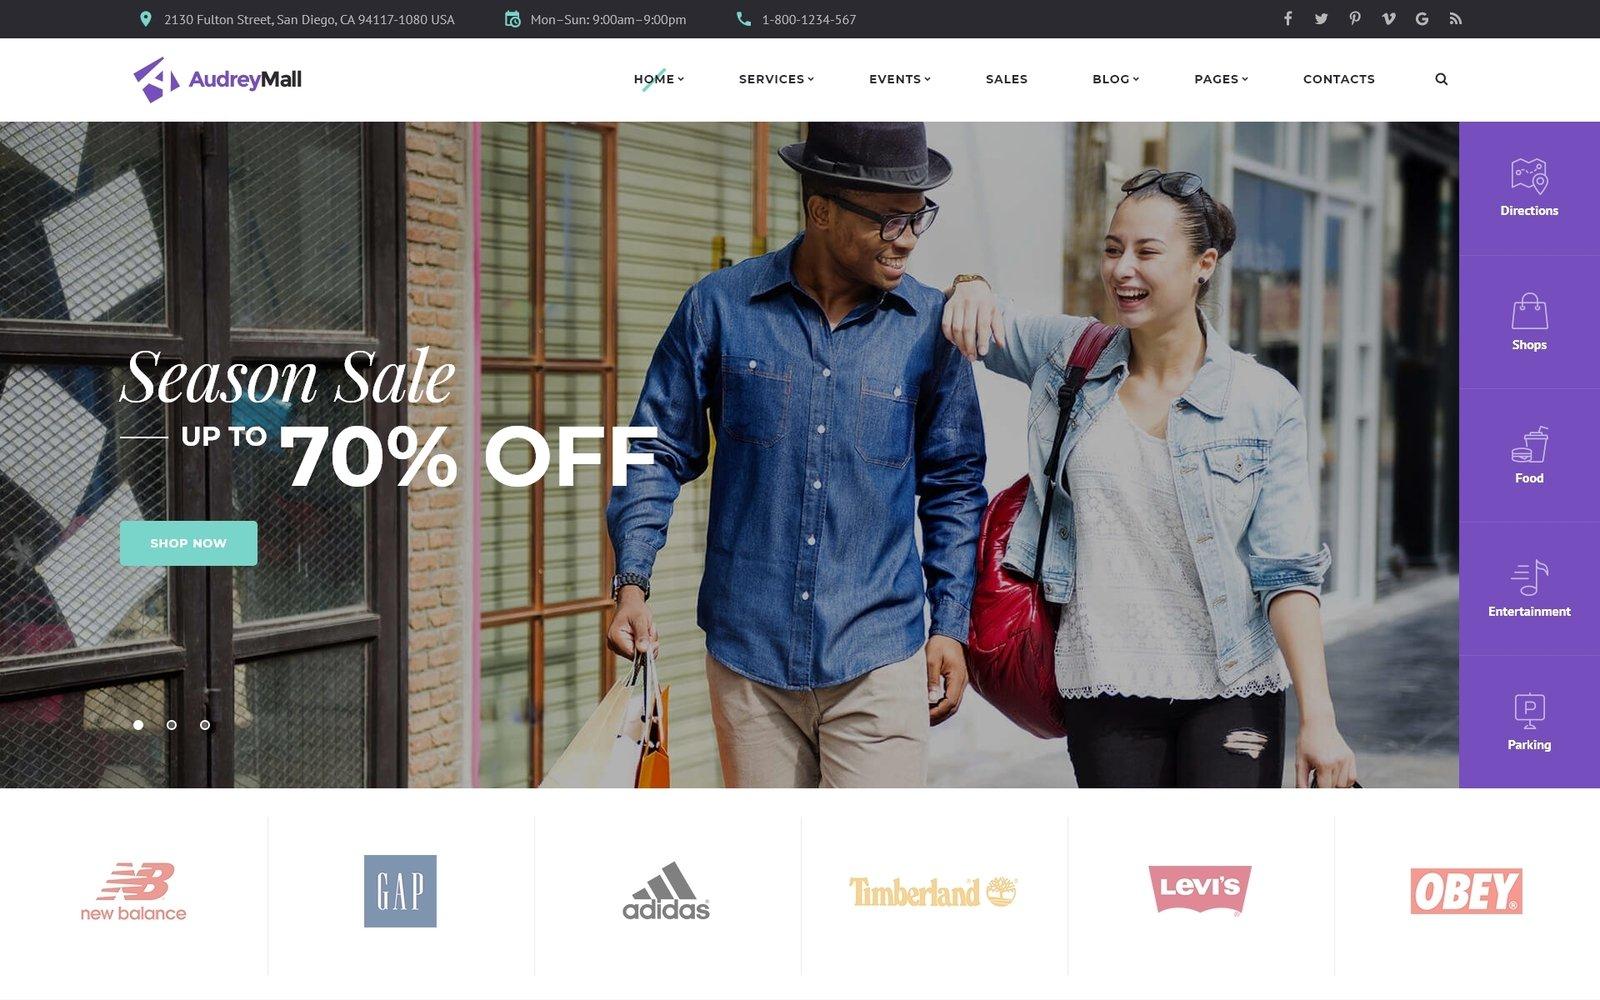 """Audrey Mall - Shopping Center, Entertainment Store"" Responsive Website template №61211"